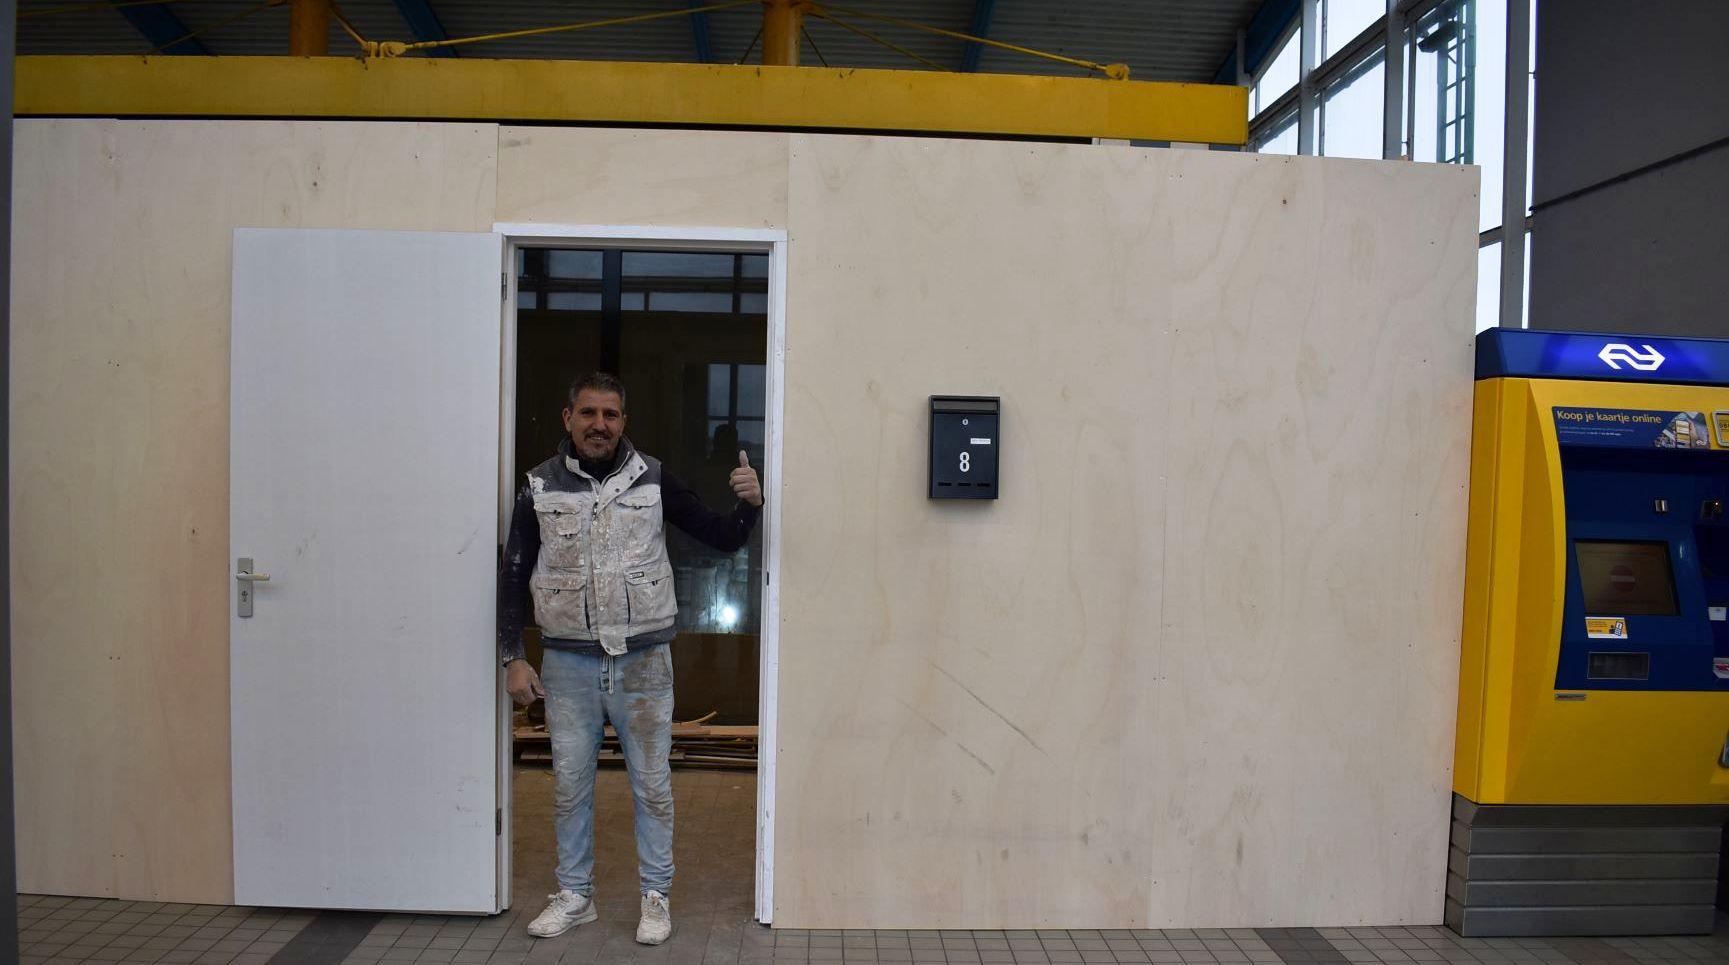 Kiosk treinstation Zoetermeer